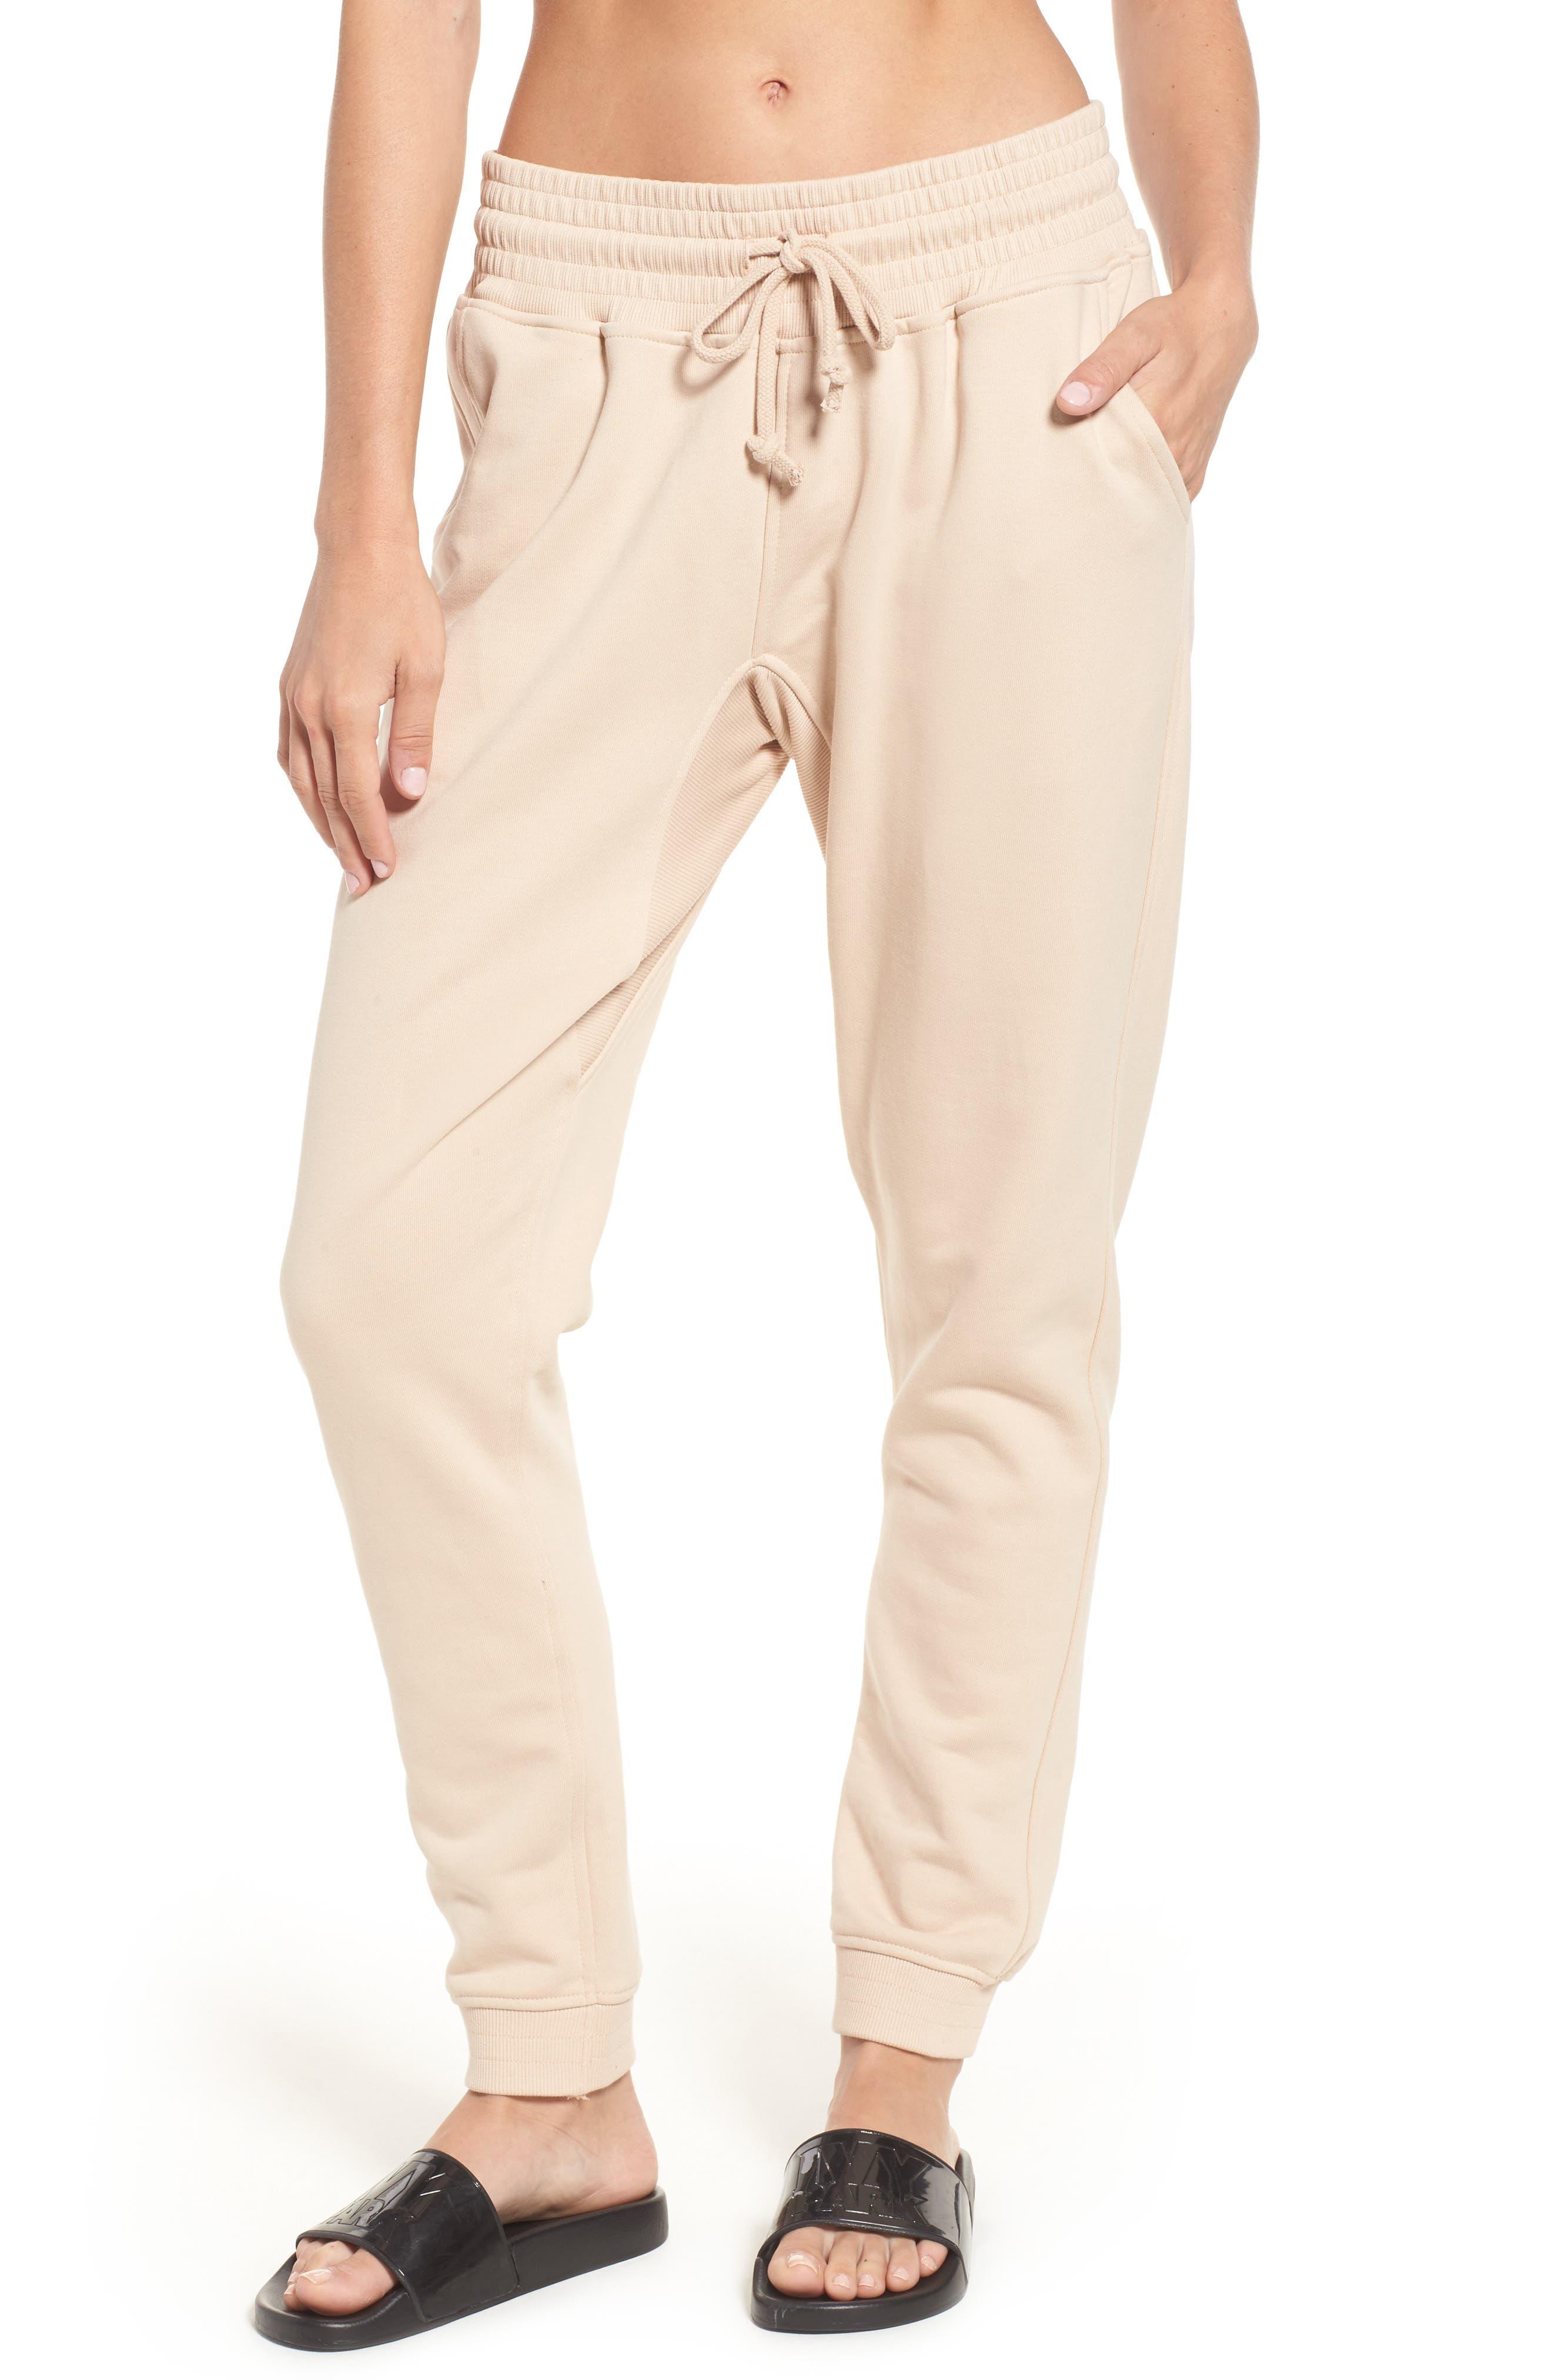 Main Image - IVY PARK® Oversize Washed Jersey Jogger Sweatpants